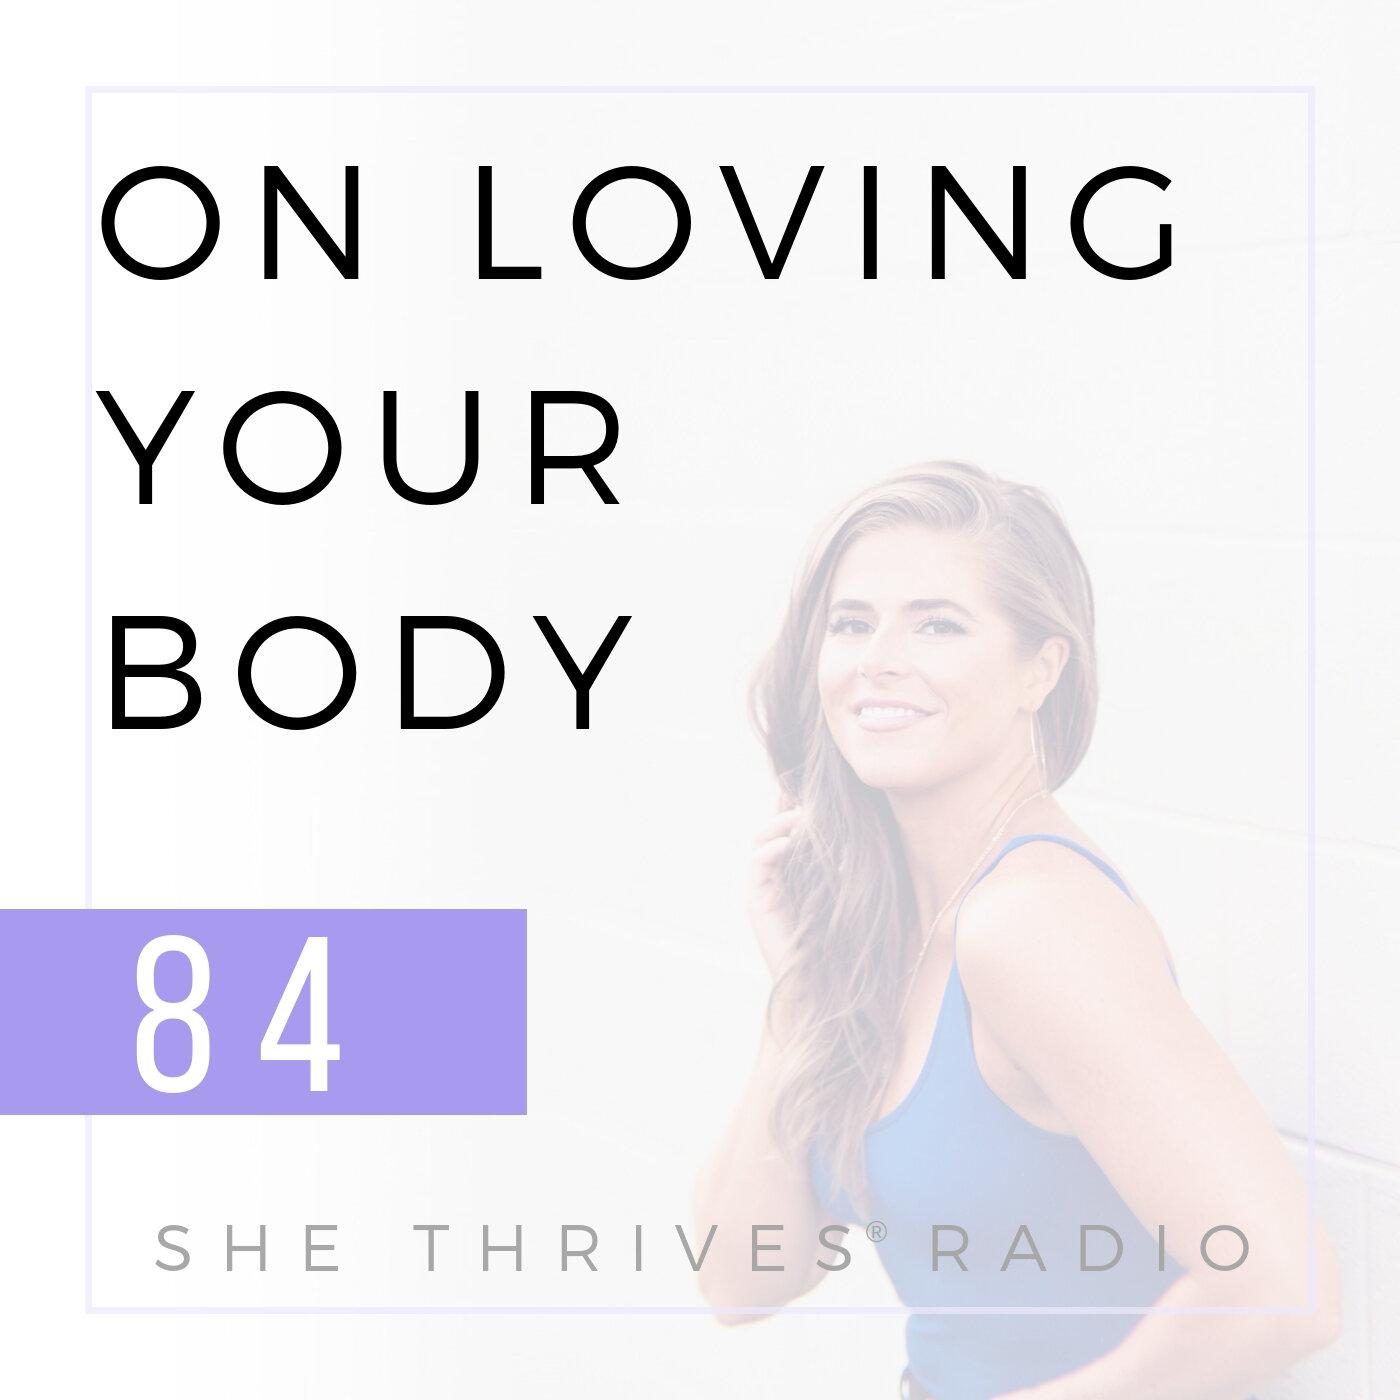 84 | On Loving Your Body | SHE THRIVES RADIO